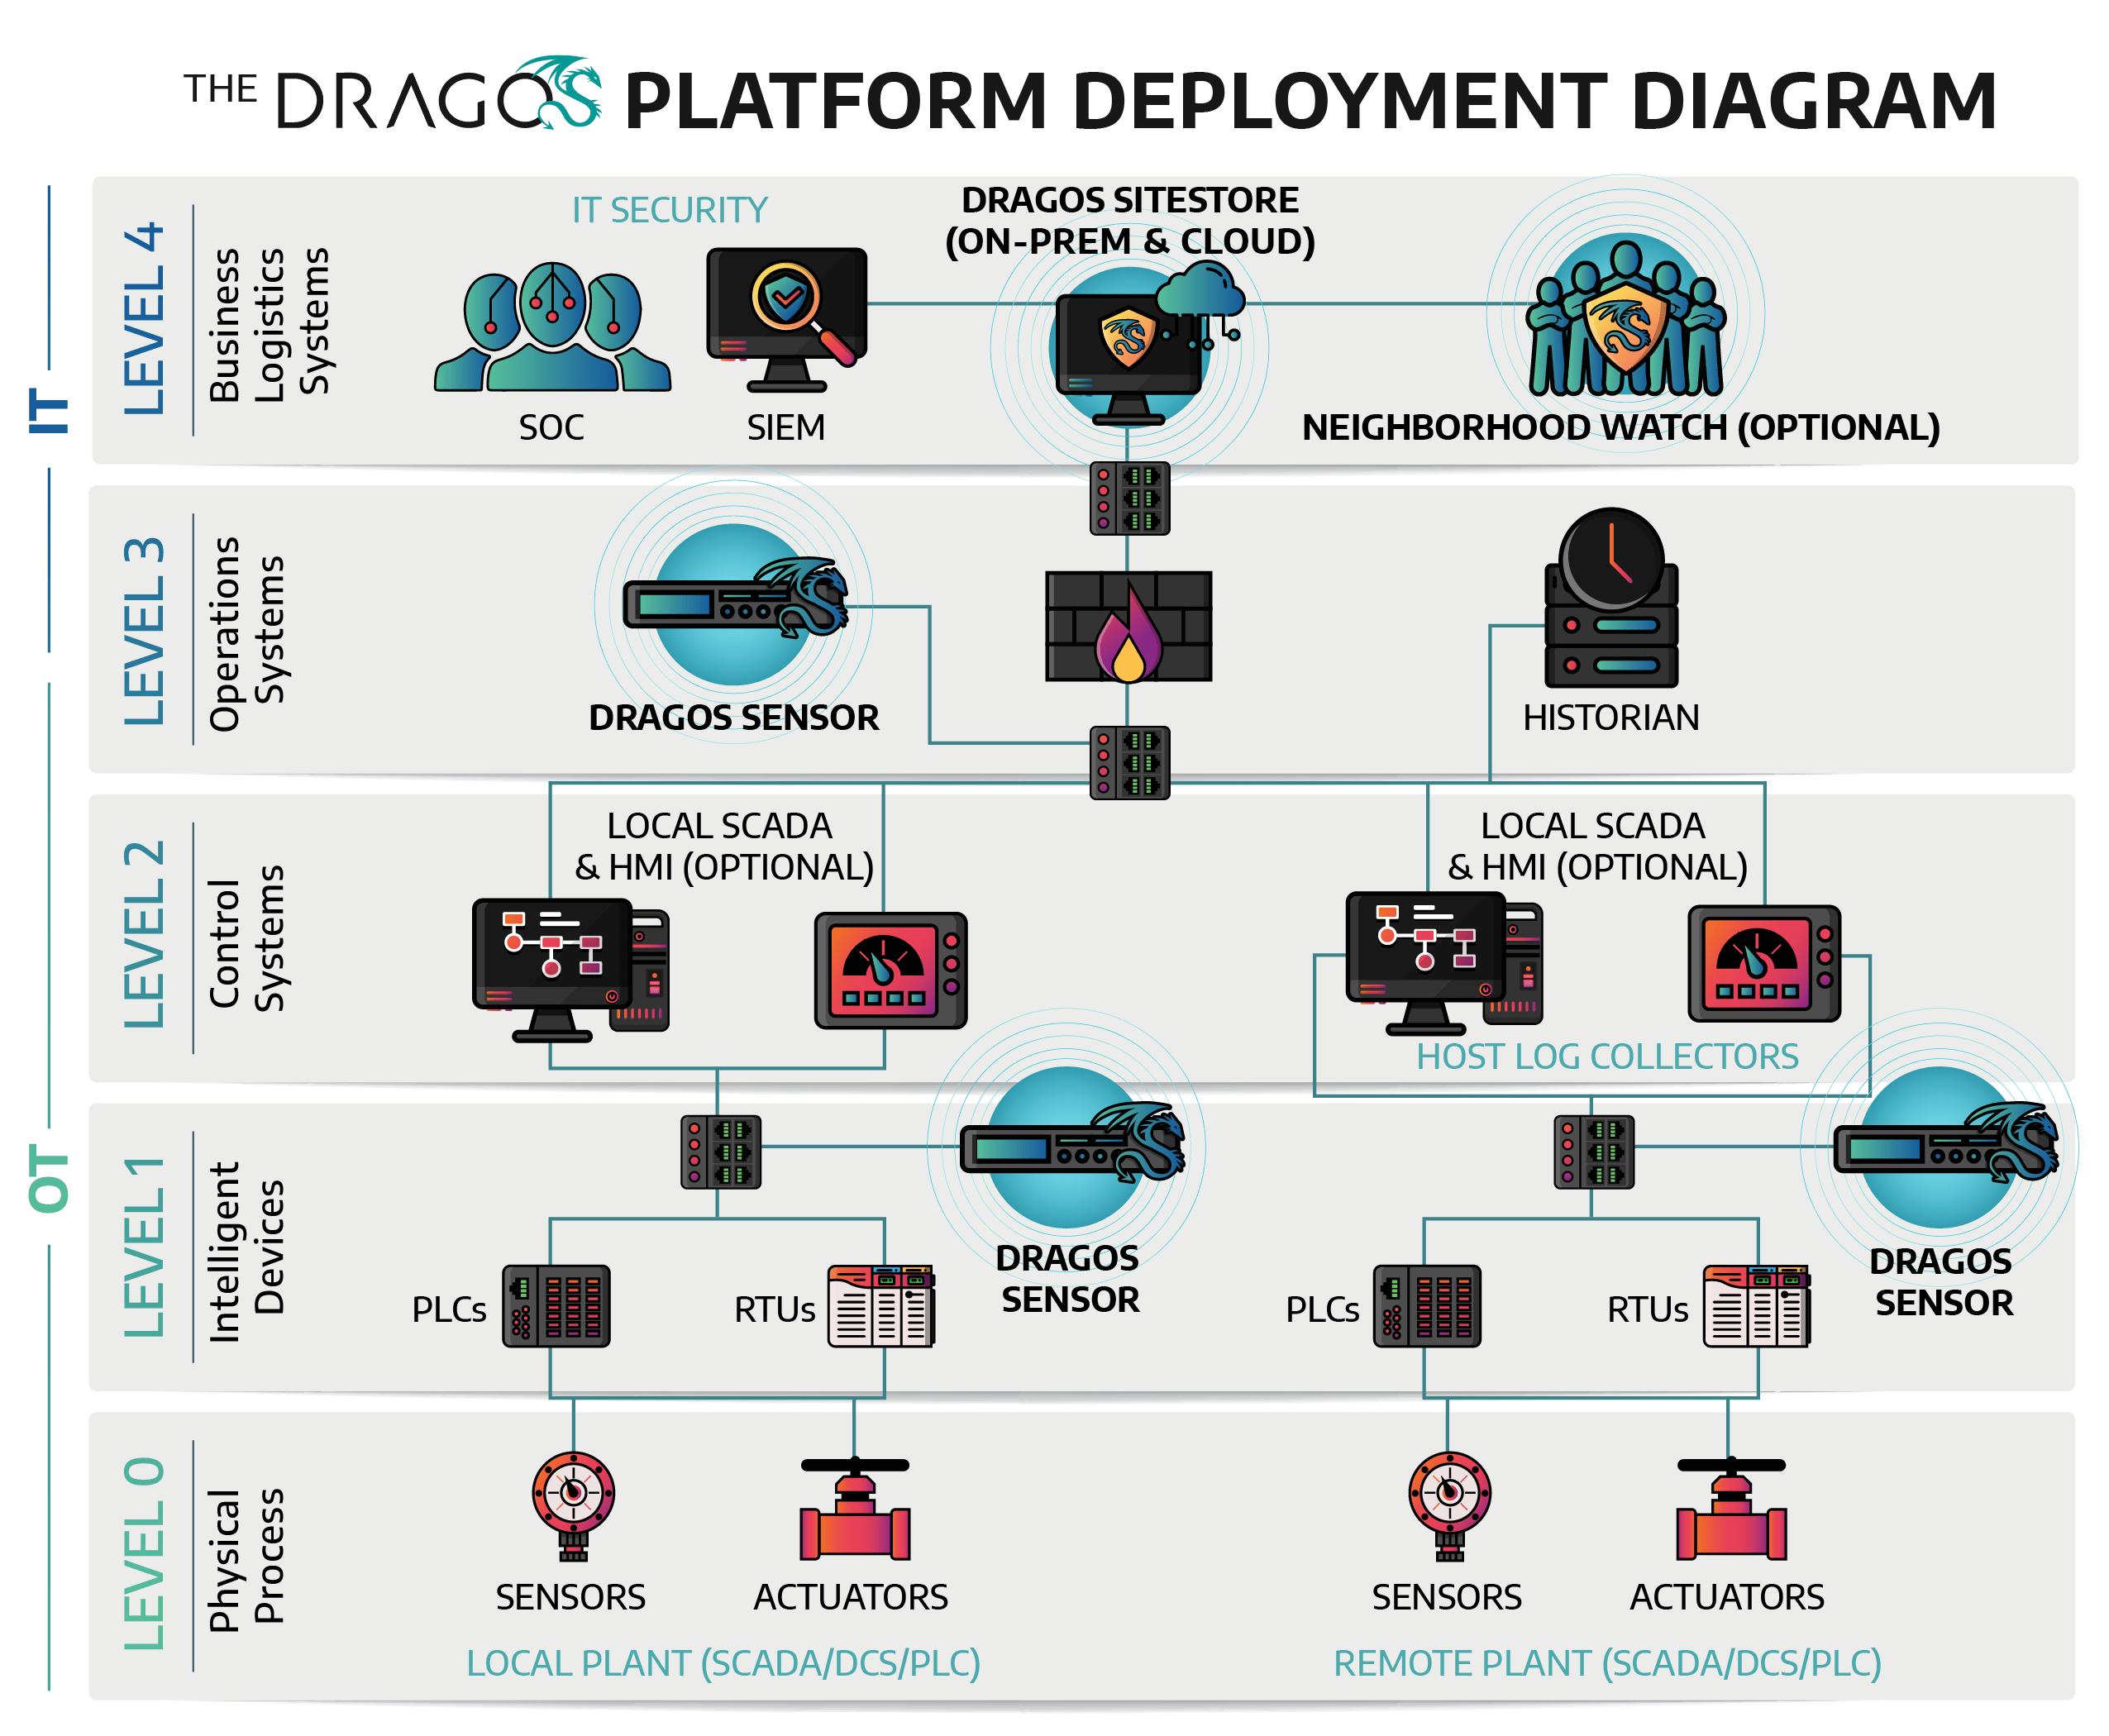 A diagram depicting the Dragos Platform Development